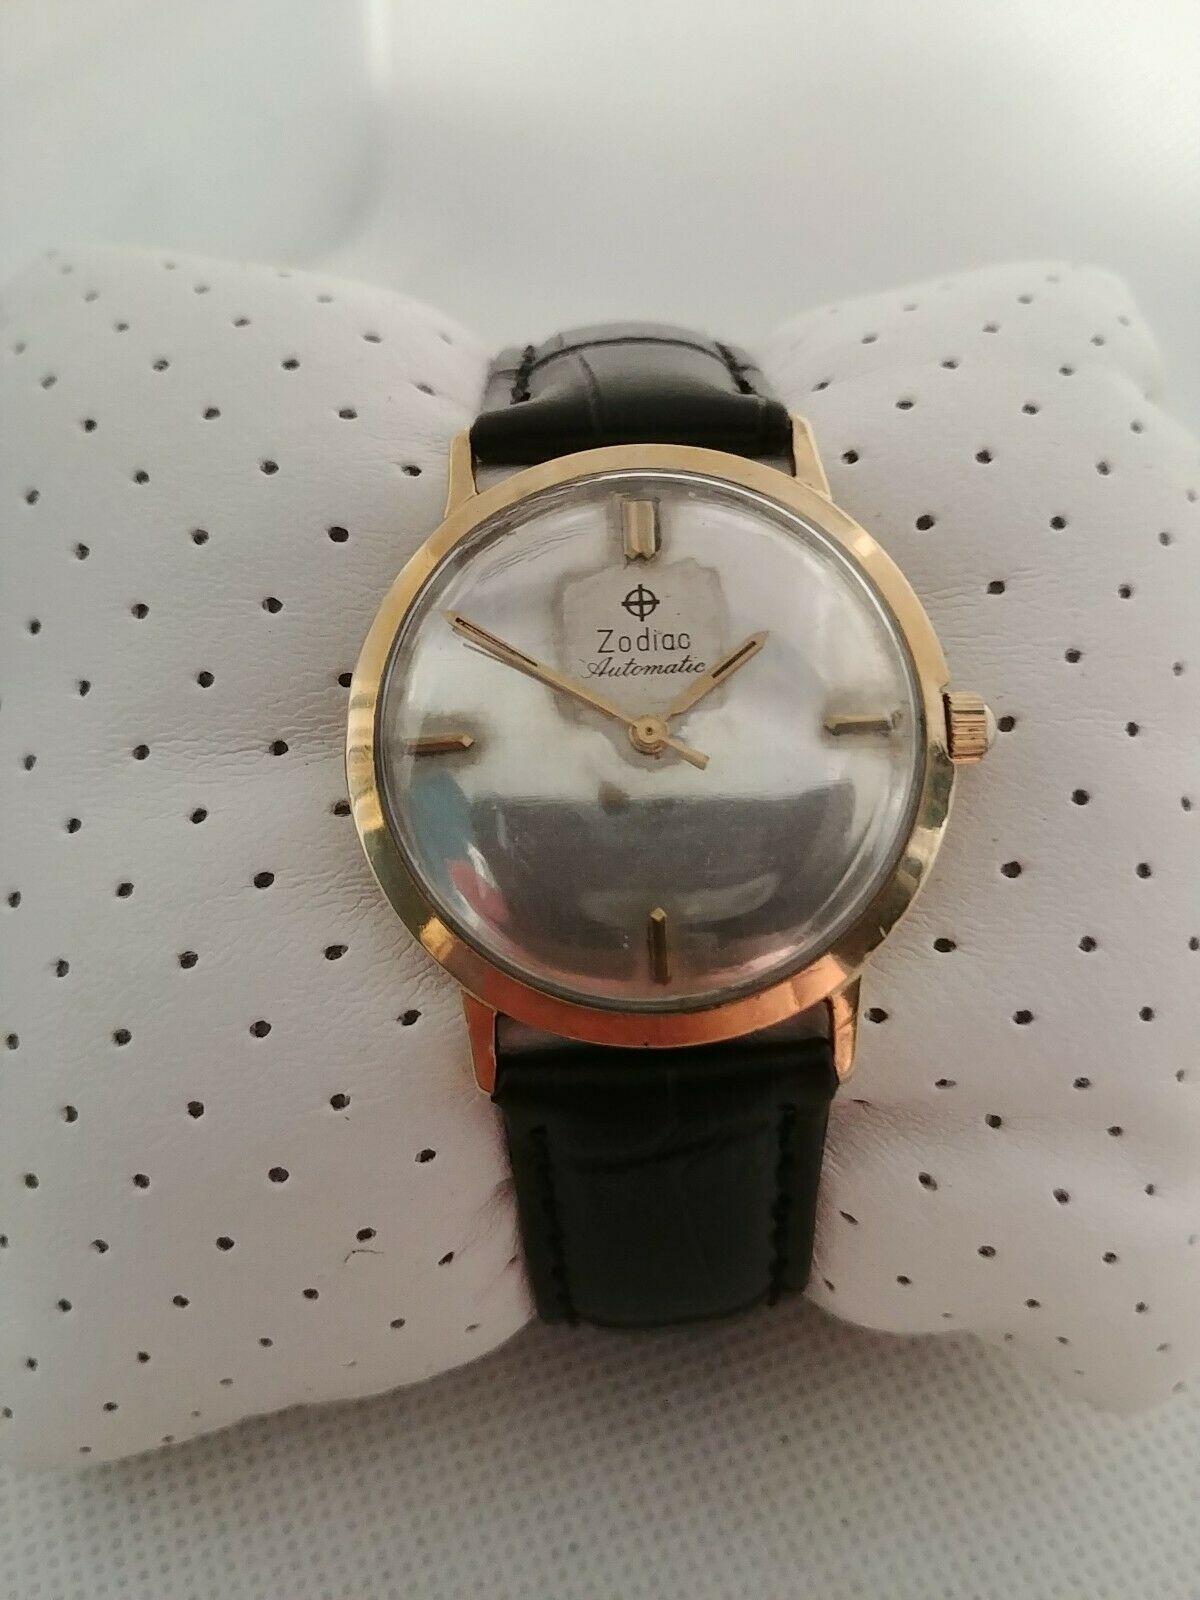 Vintage-ZODIAC-Automatic-10kt-Gold-Filled-Mens-Wristwatch.jpg